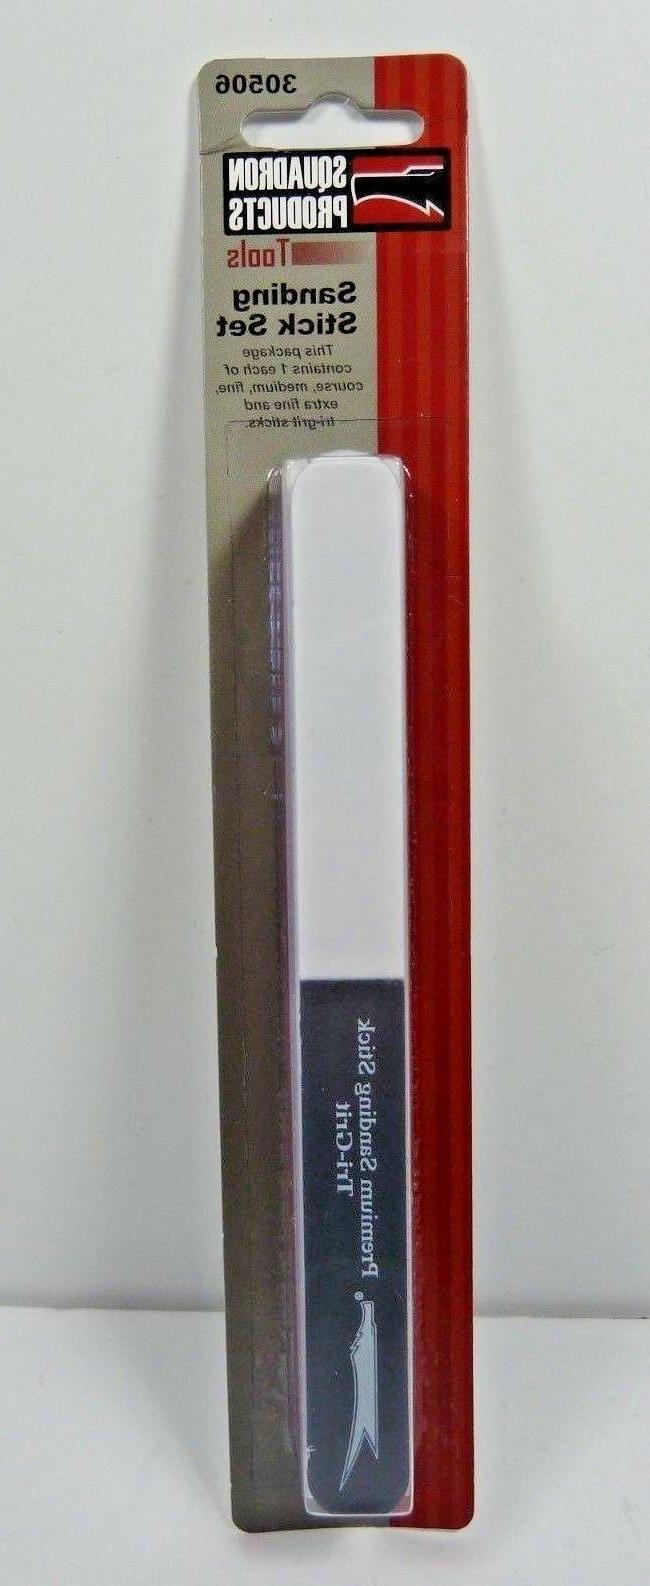 Squadron Products 5 Sanding Stick Set 30506 coarse - extra f